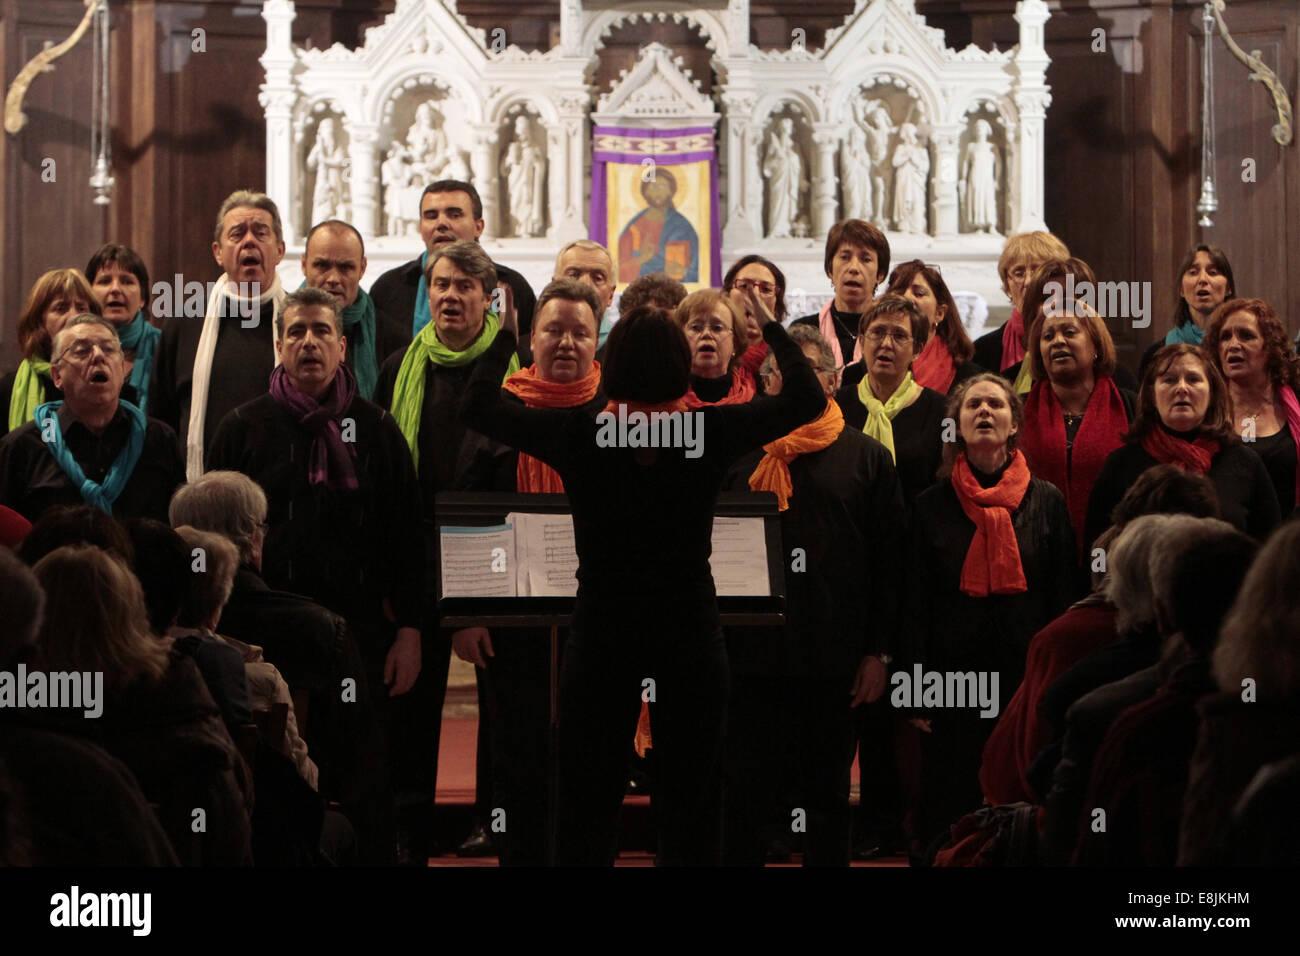 Chorale 'Helping Choir'. St. George Church. - Stock Image